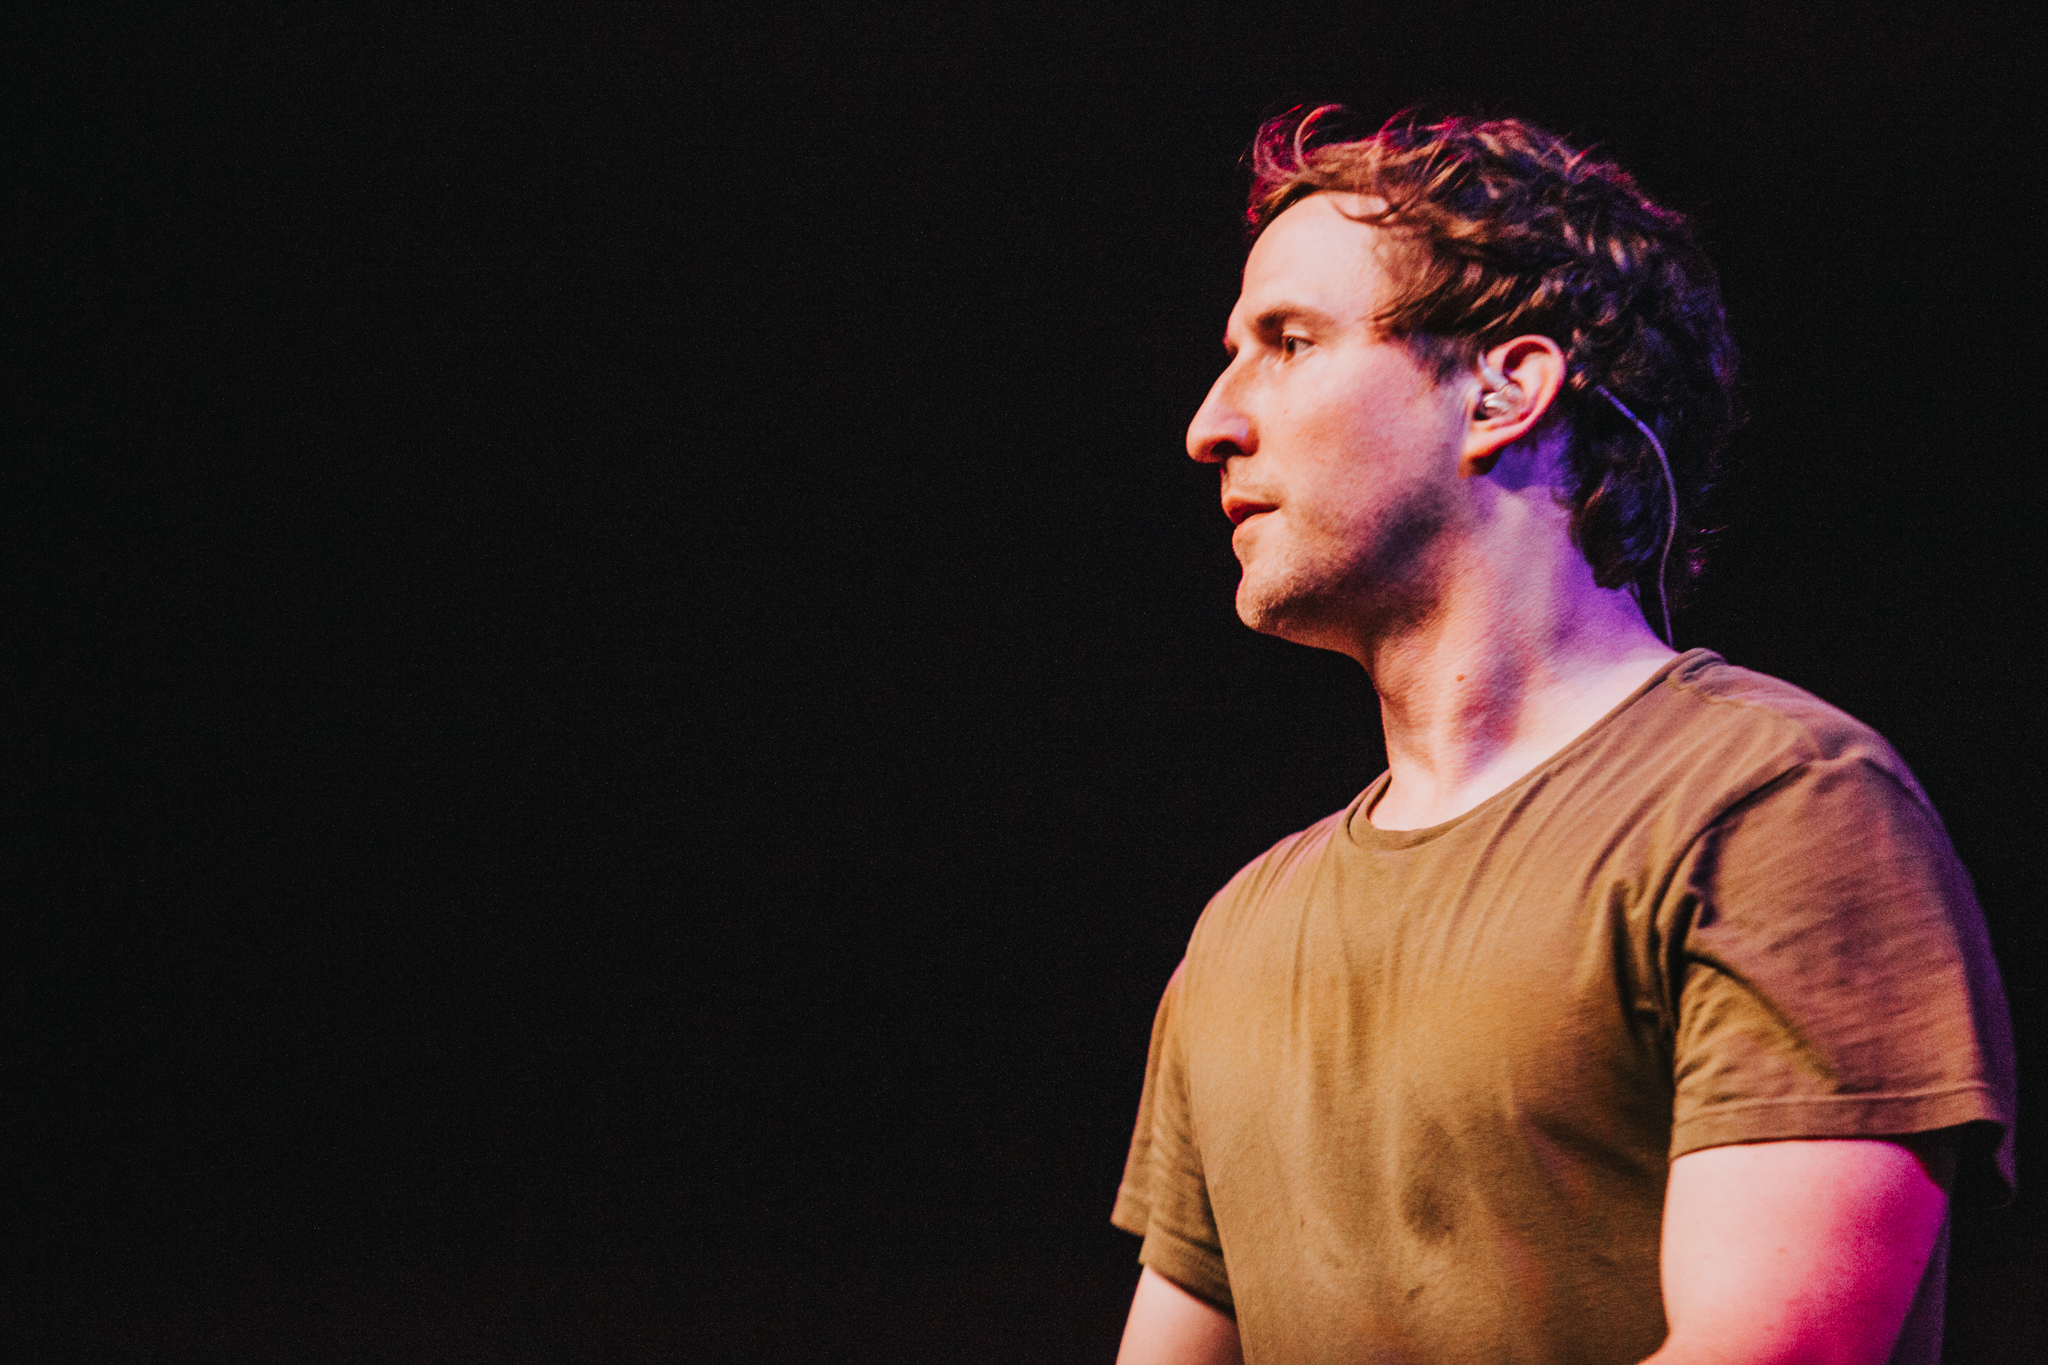 Lafferty Photo - Dance Gavin Dance 03.08.17-8194.jpg